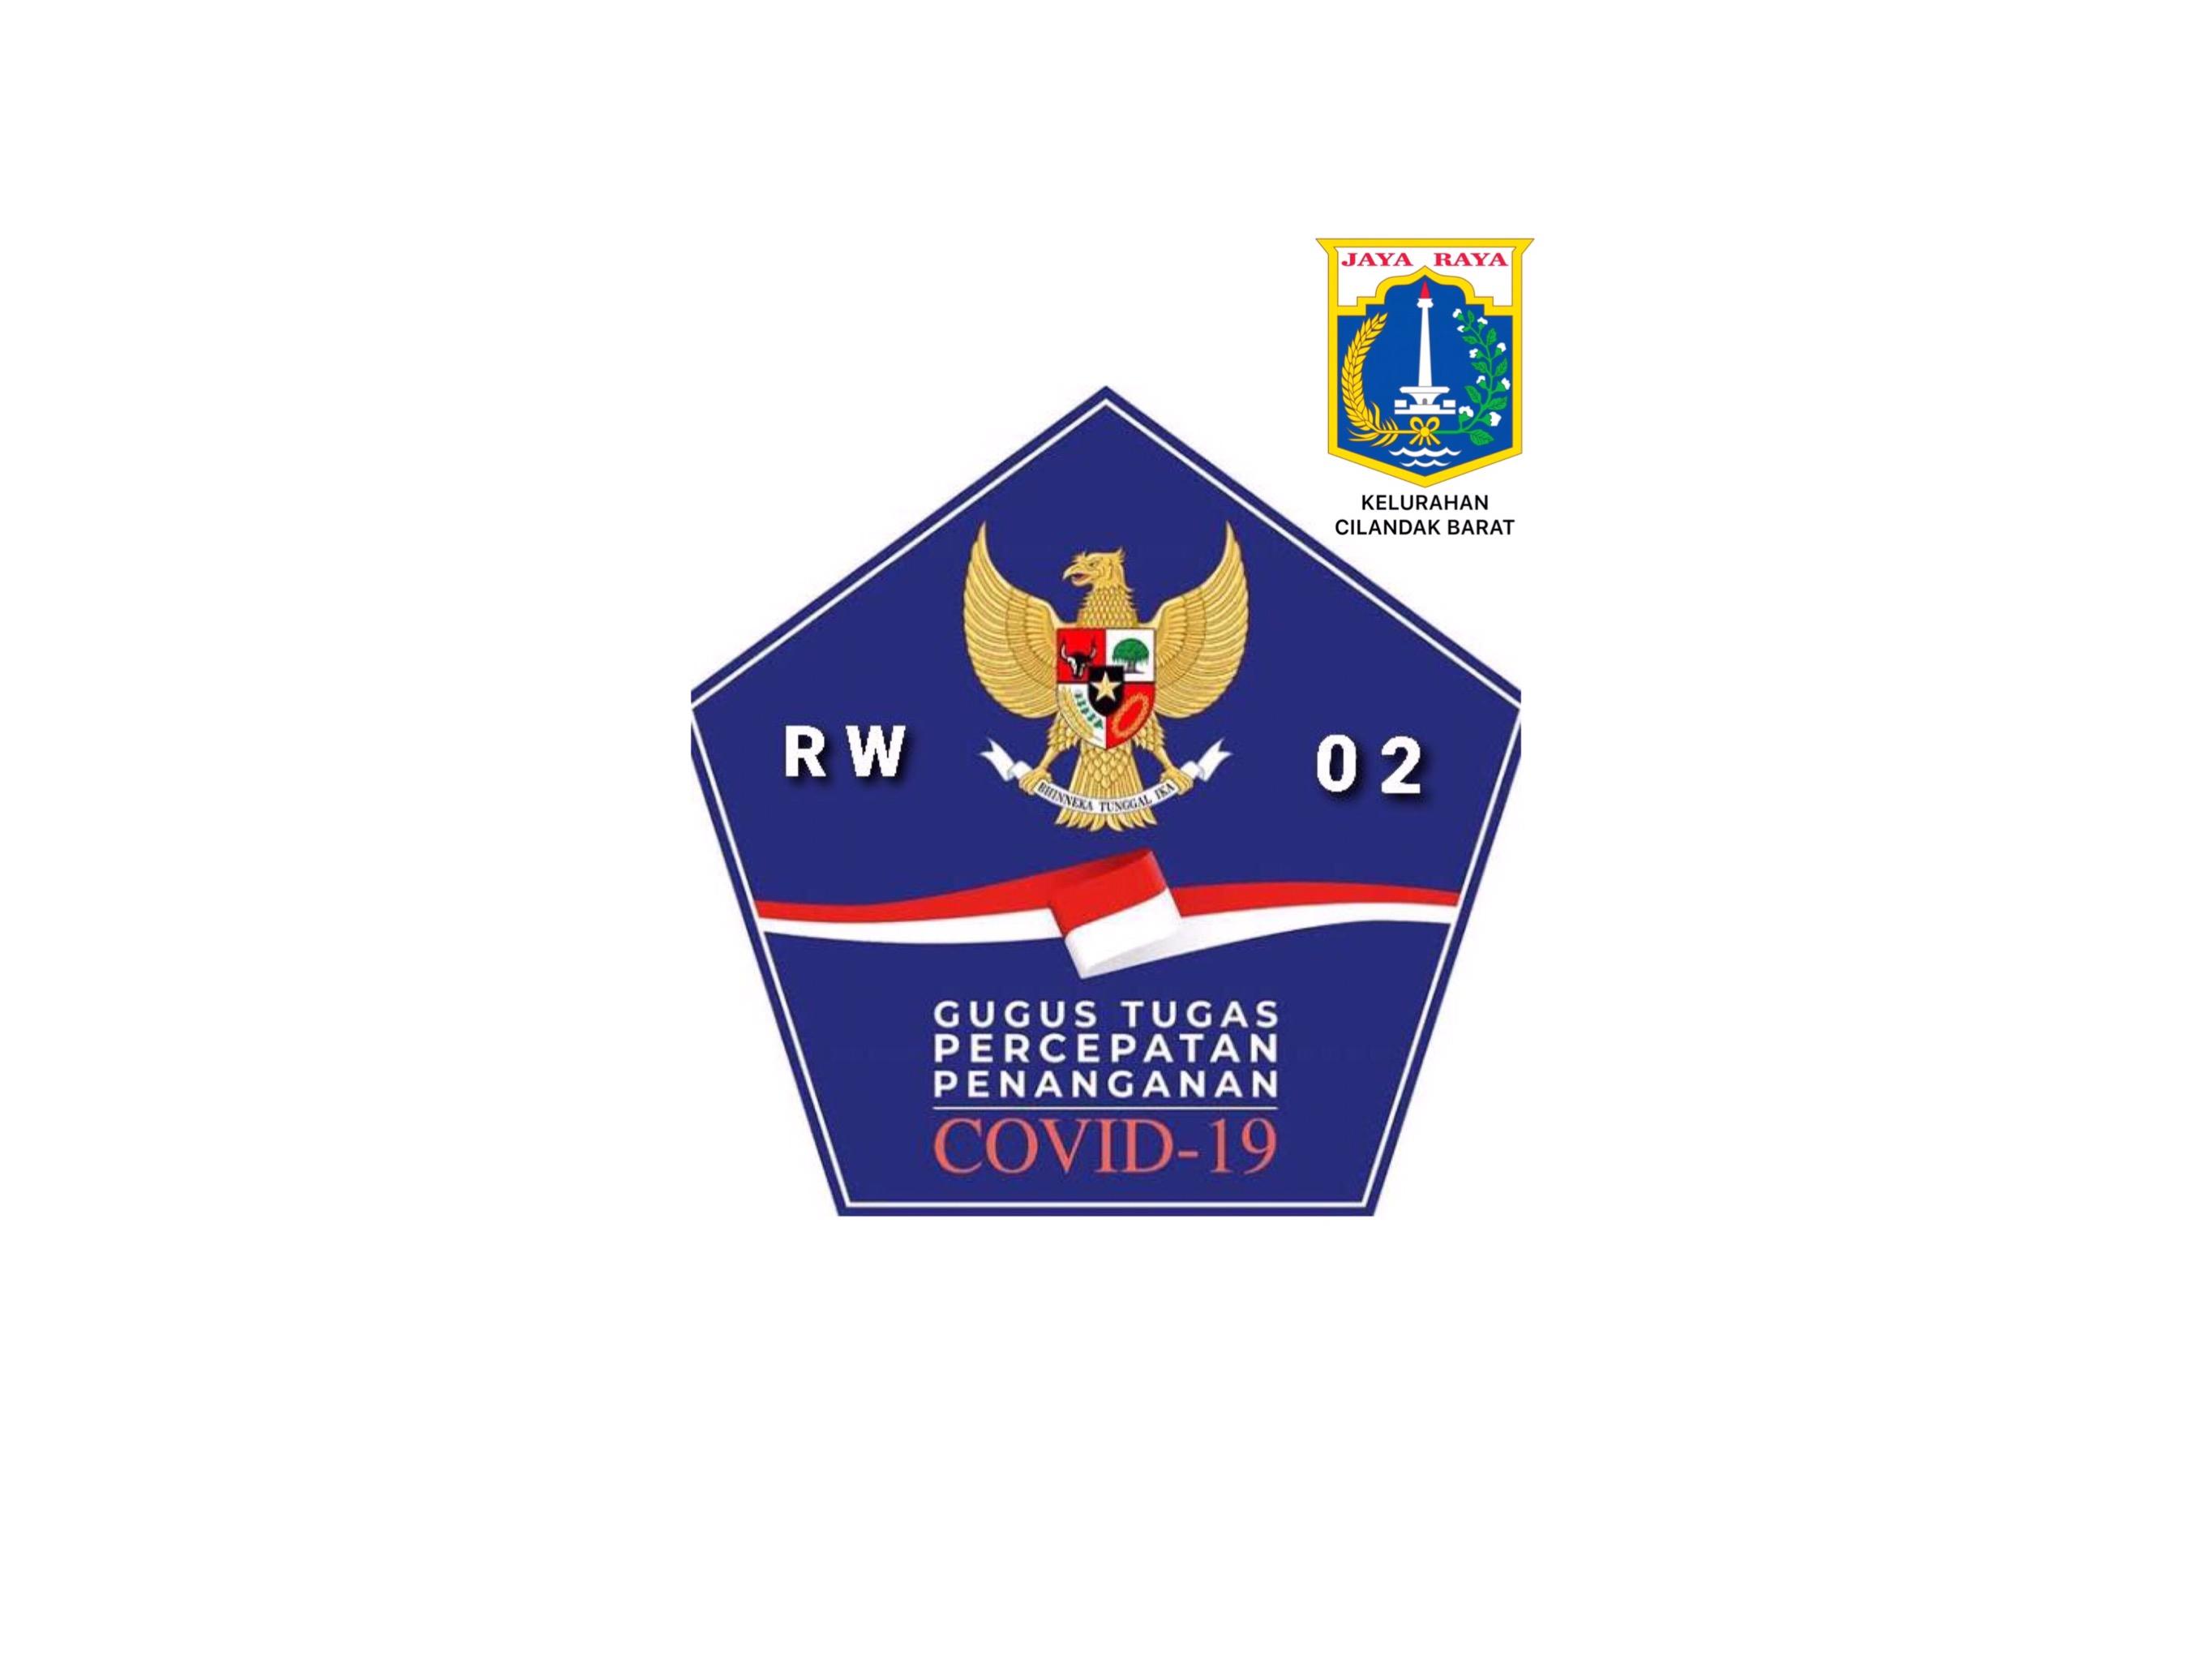 RW 02